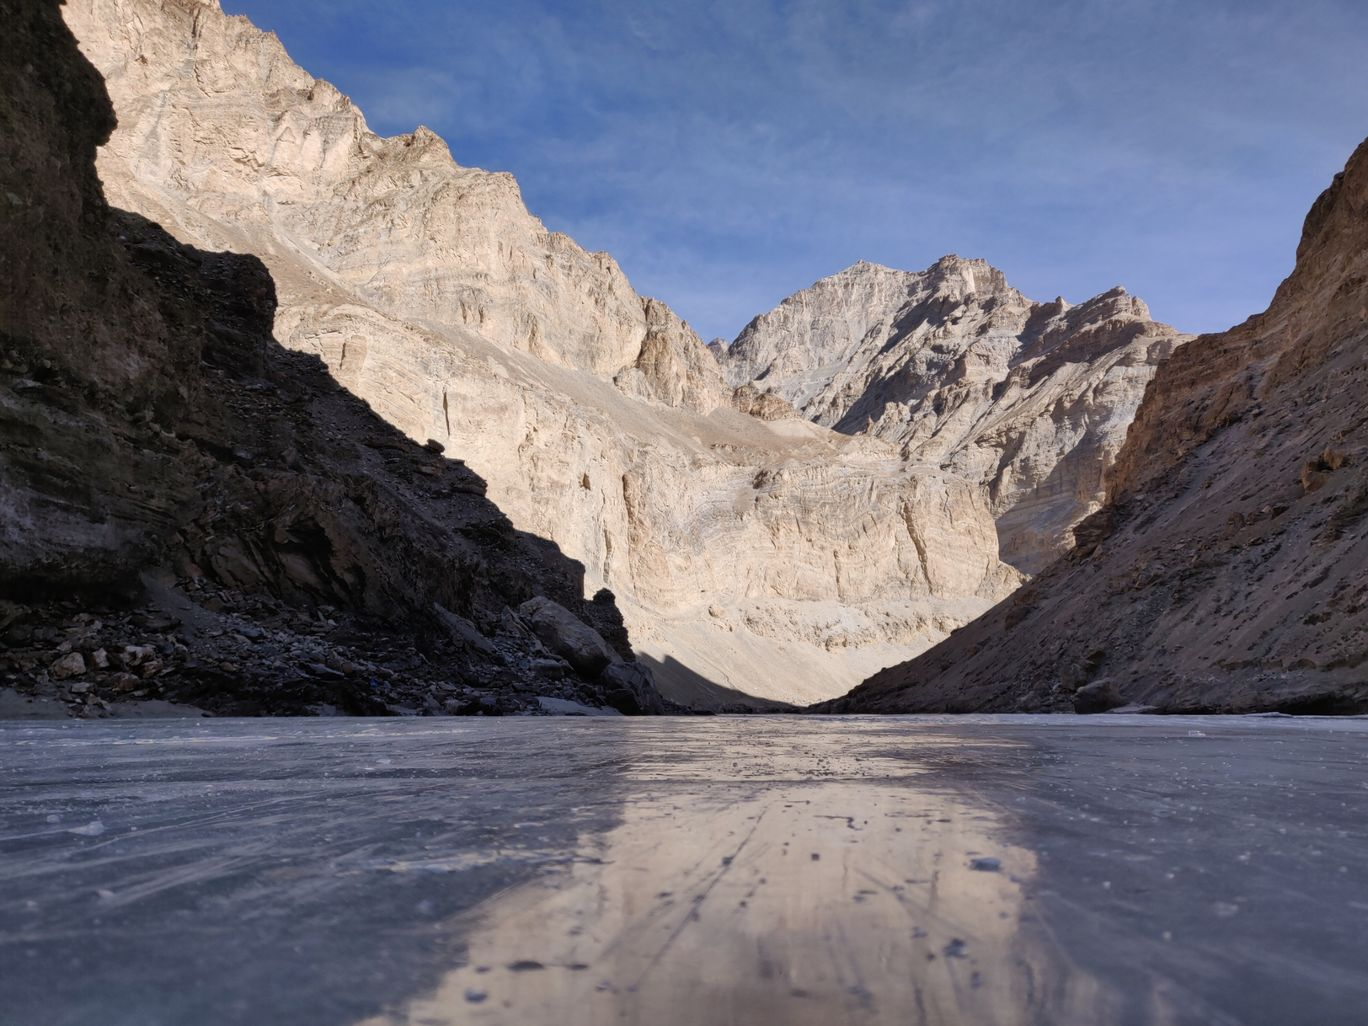 Photo of Chadar trek - Trekking In Ladakh - Frozen River Trekking In Ladakh By Kritika Rastogi